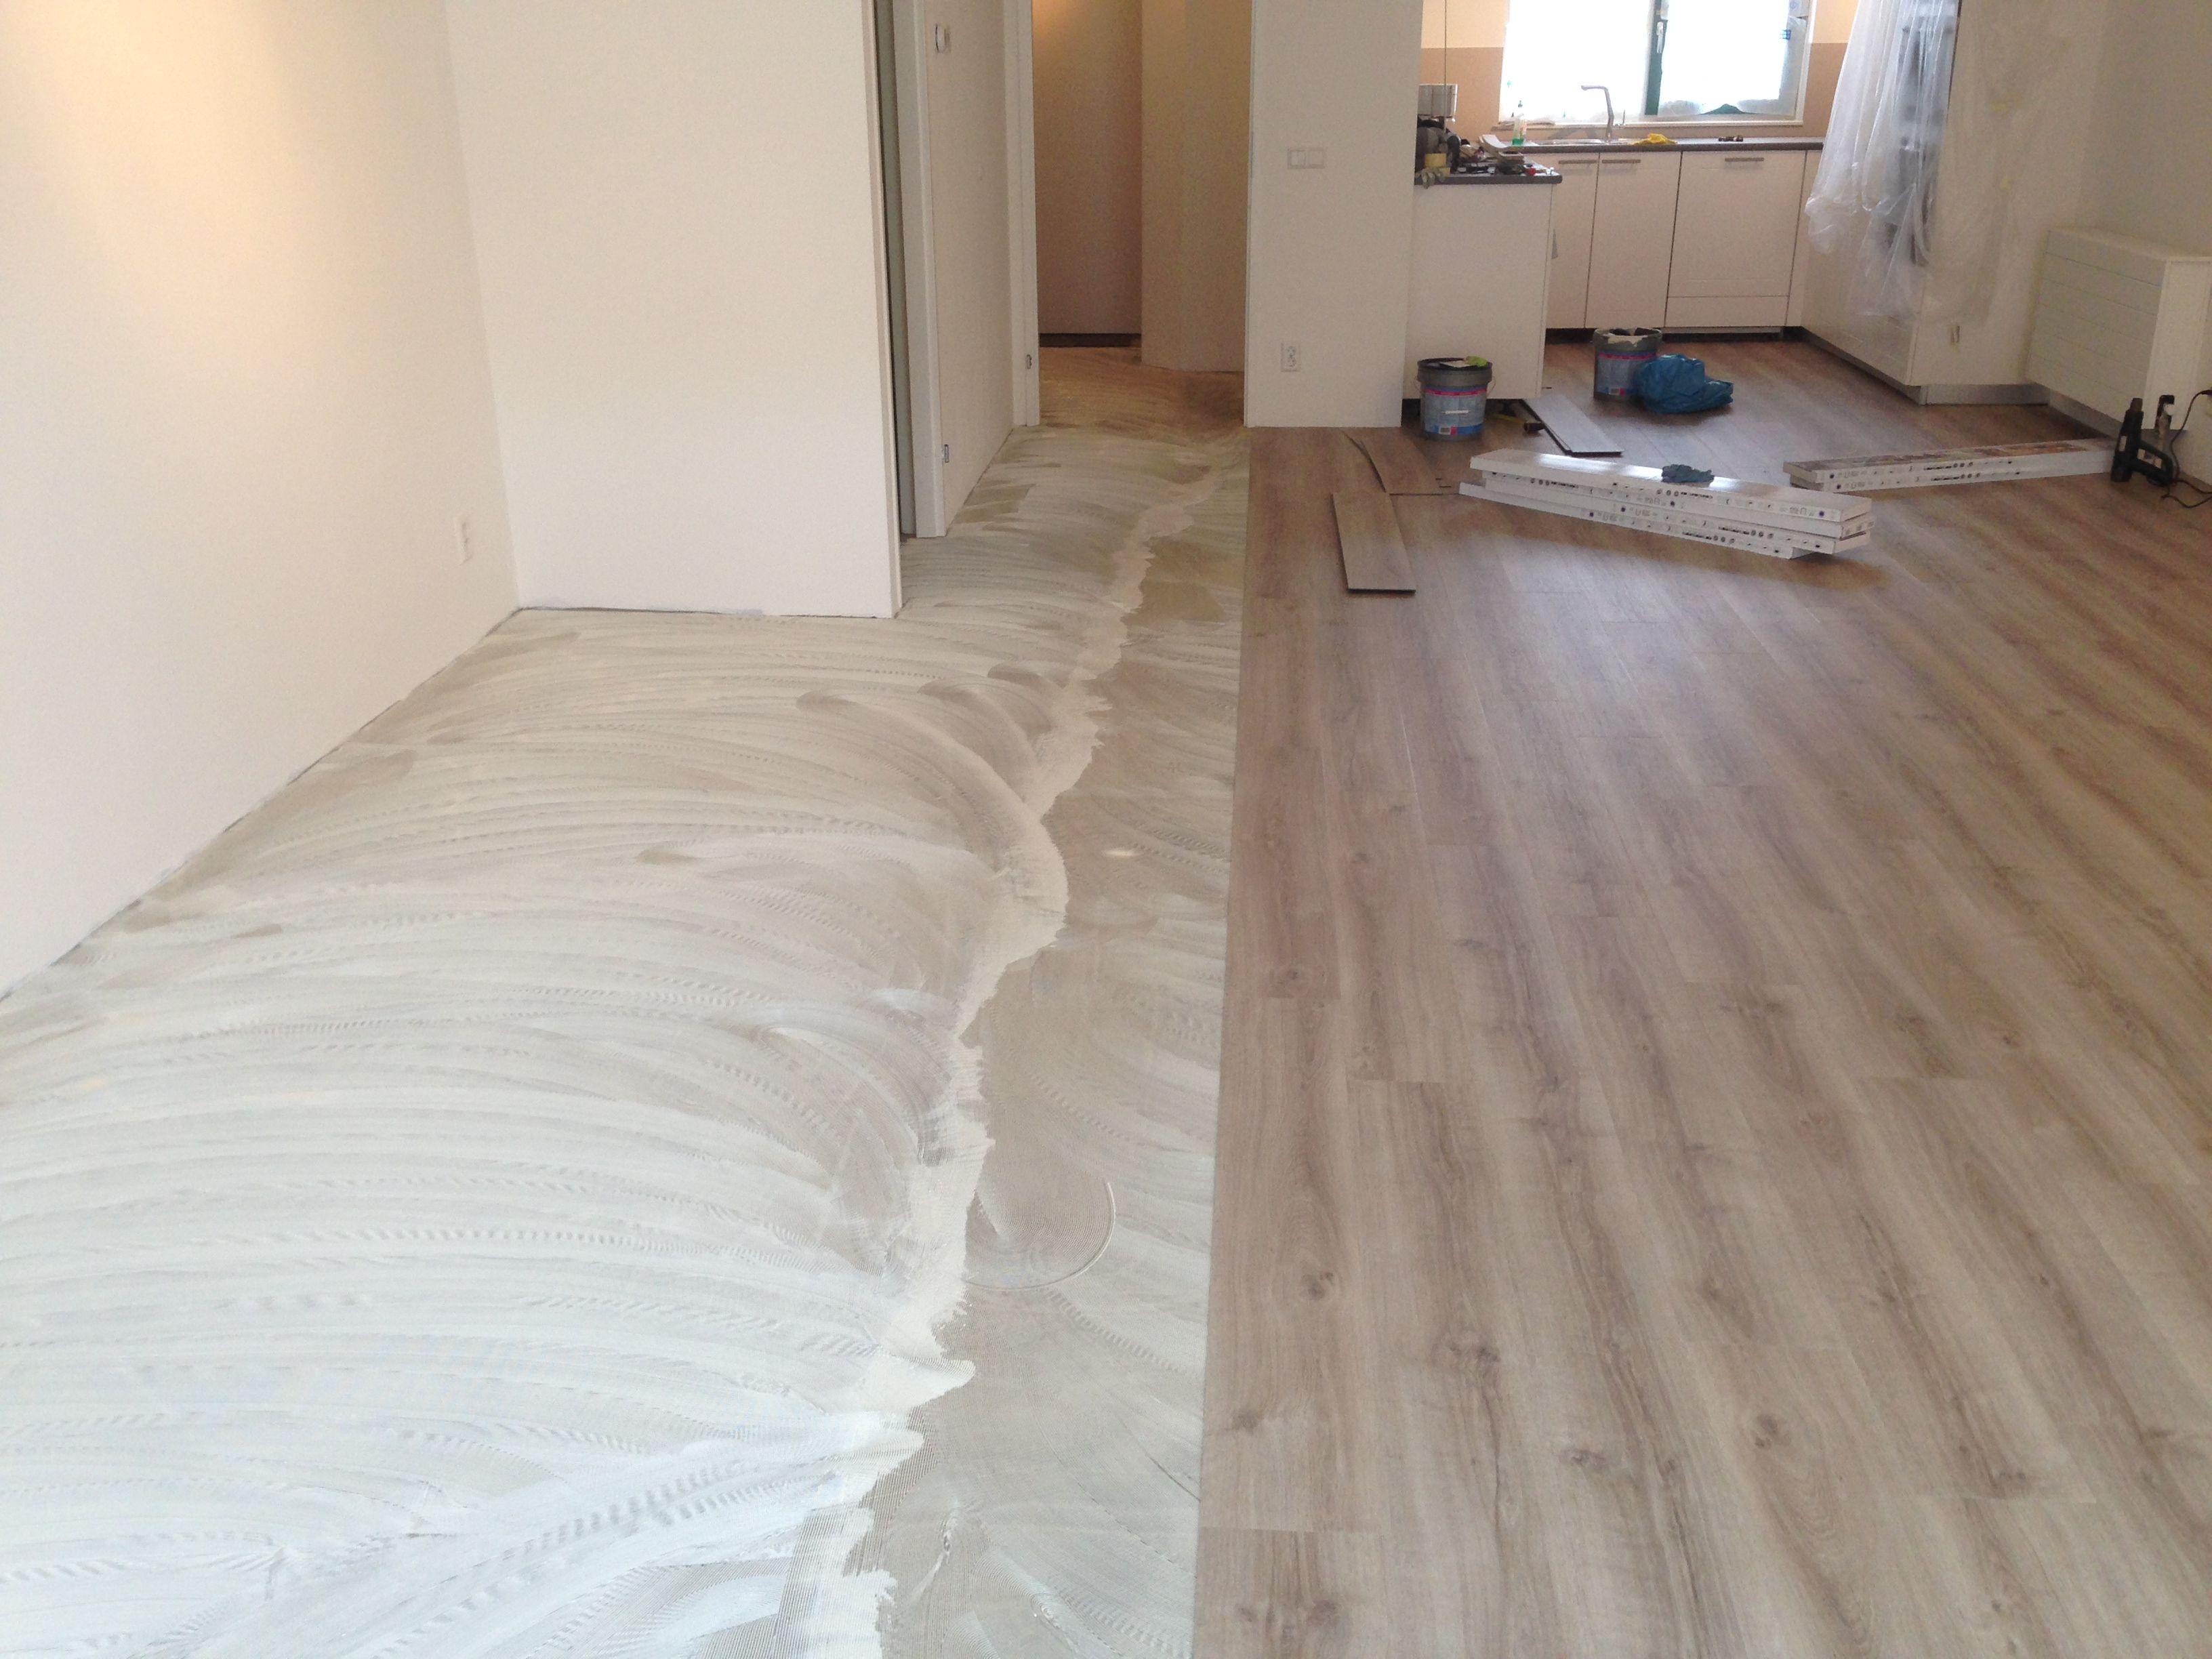 Bodiax rich dry back pvc vloer gelegd op een vloer met